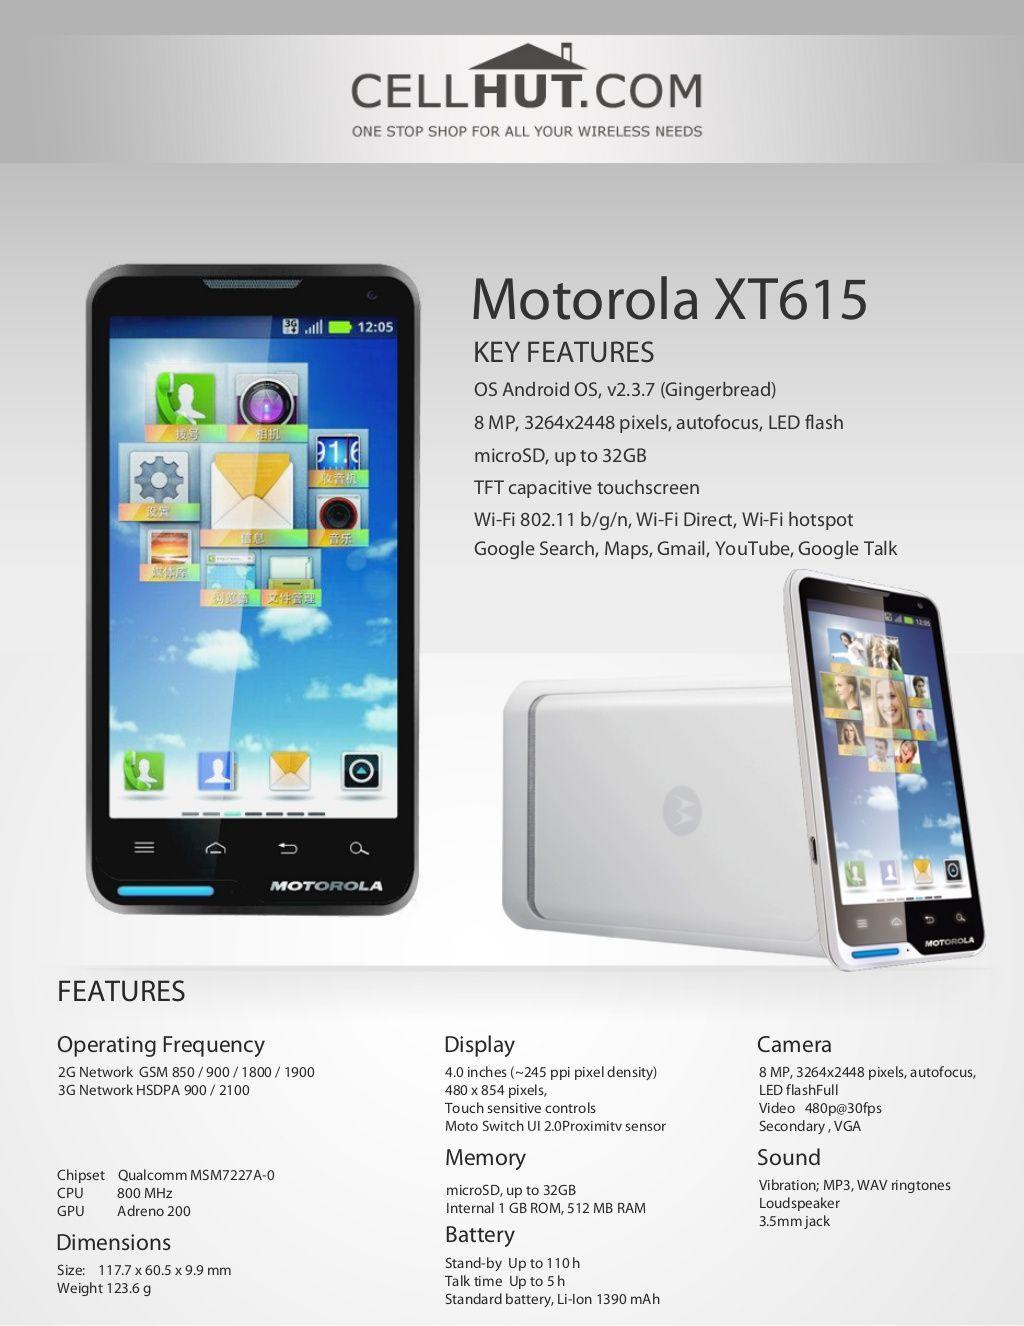 New cell phone battery for samsung ativ s gt i8750 i8750 omnia odyssey - Motorola Xt615 Unlocked Quadband Gsm Cell Phone 14935487 By